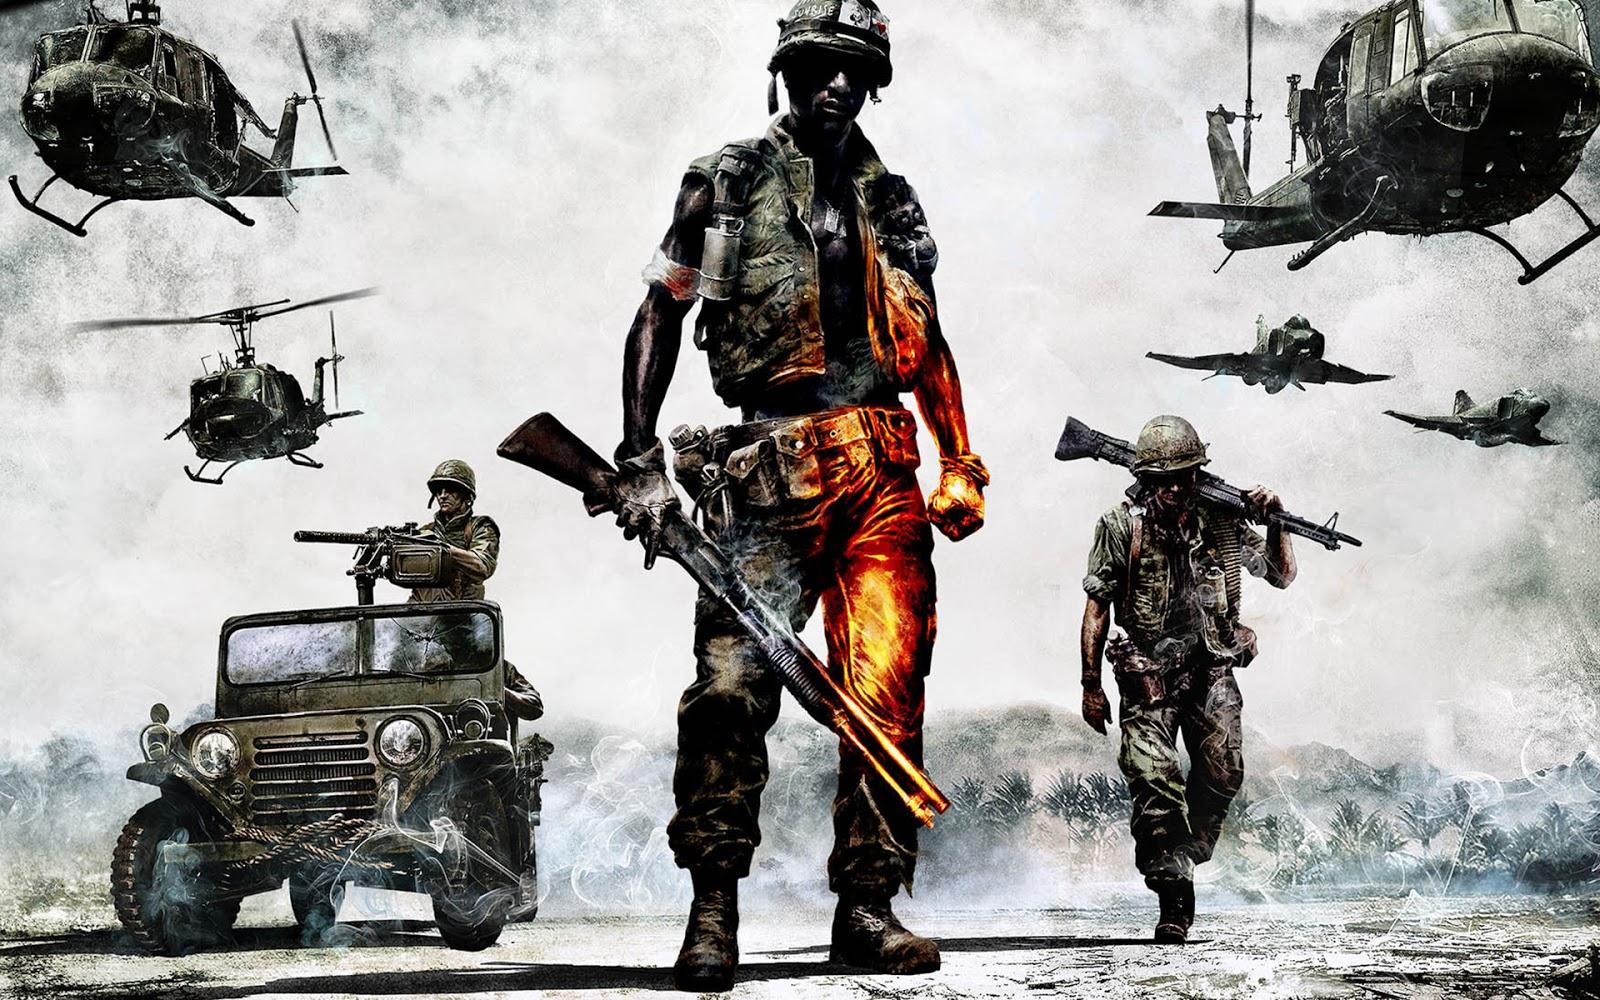 Army War Military Wallpaper Desktop Background Wallpaper Hd 1600x1000